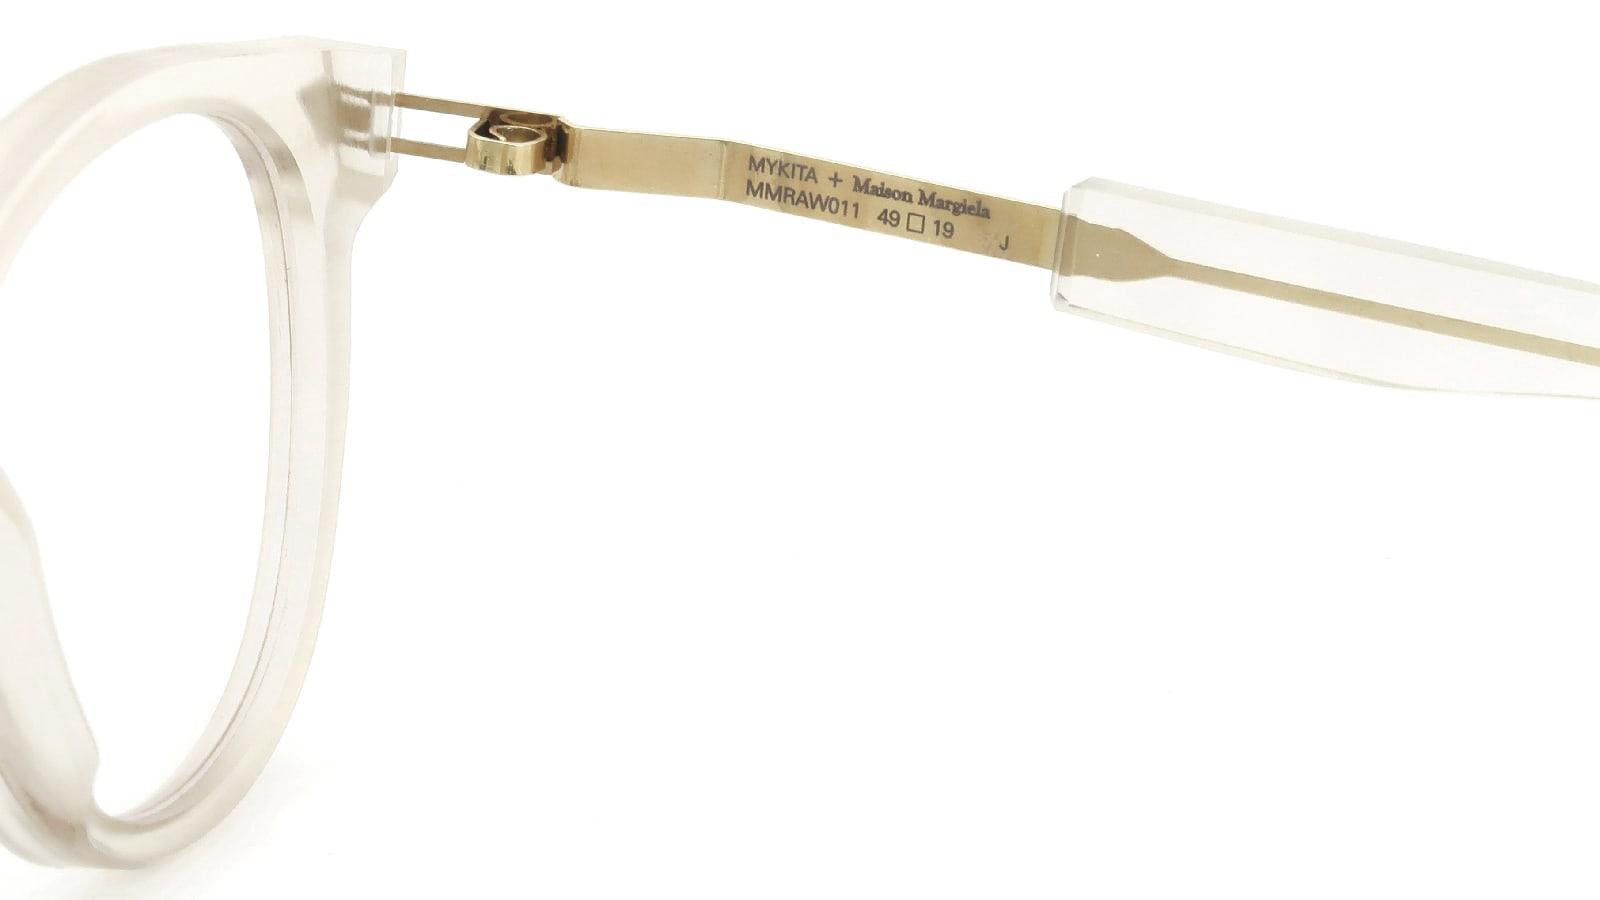 MYKITA + Maison Margiela MMRAW011 COL.846 Raw Champagne/Glossy Gold 10